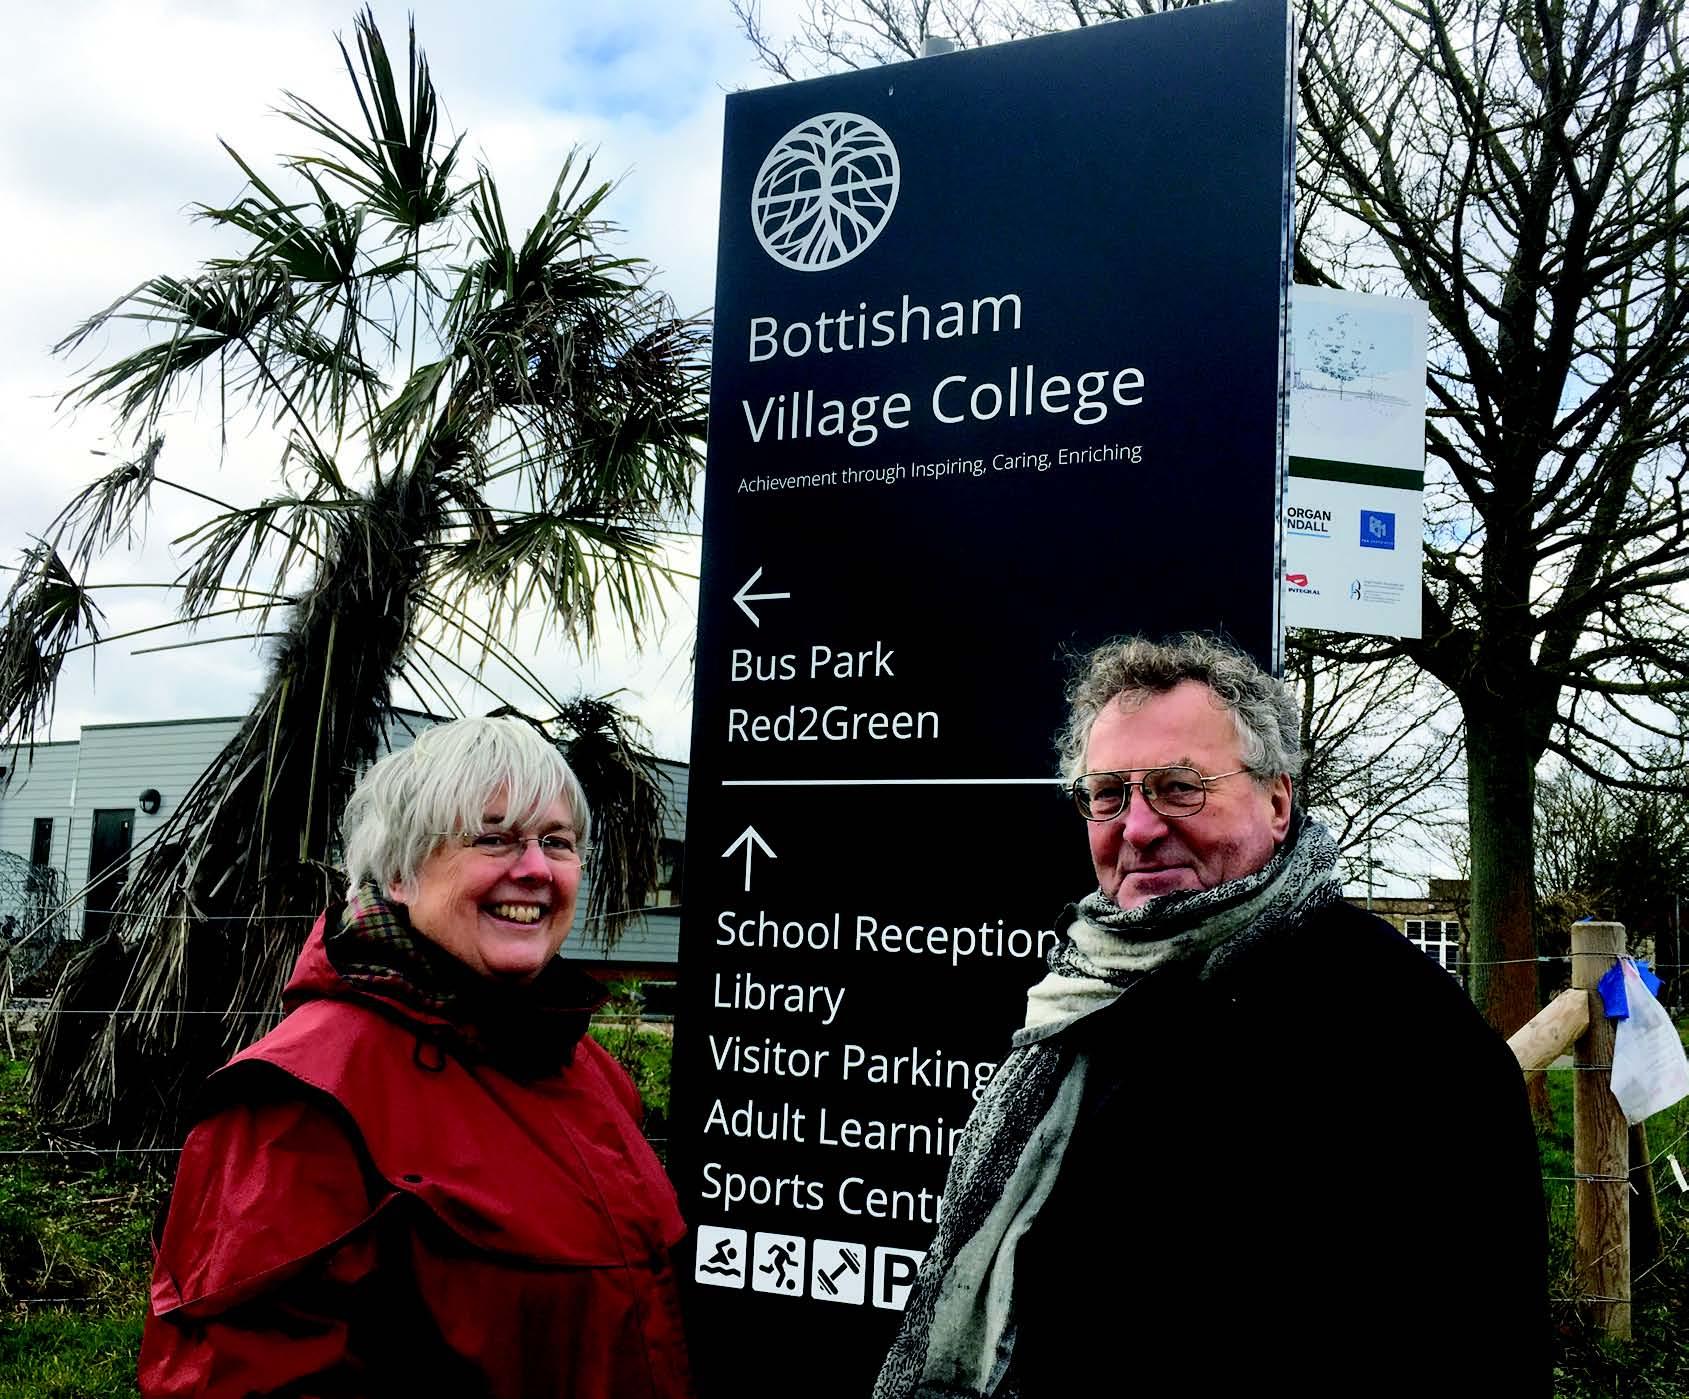 Charlotte Cane and John Trapp at Bottisham Village College